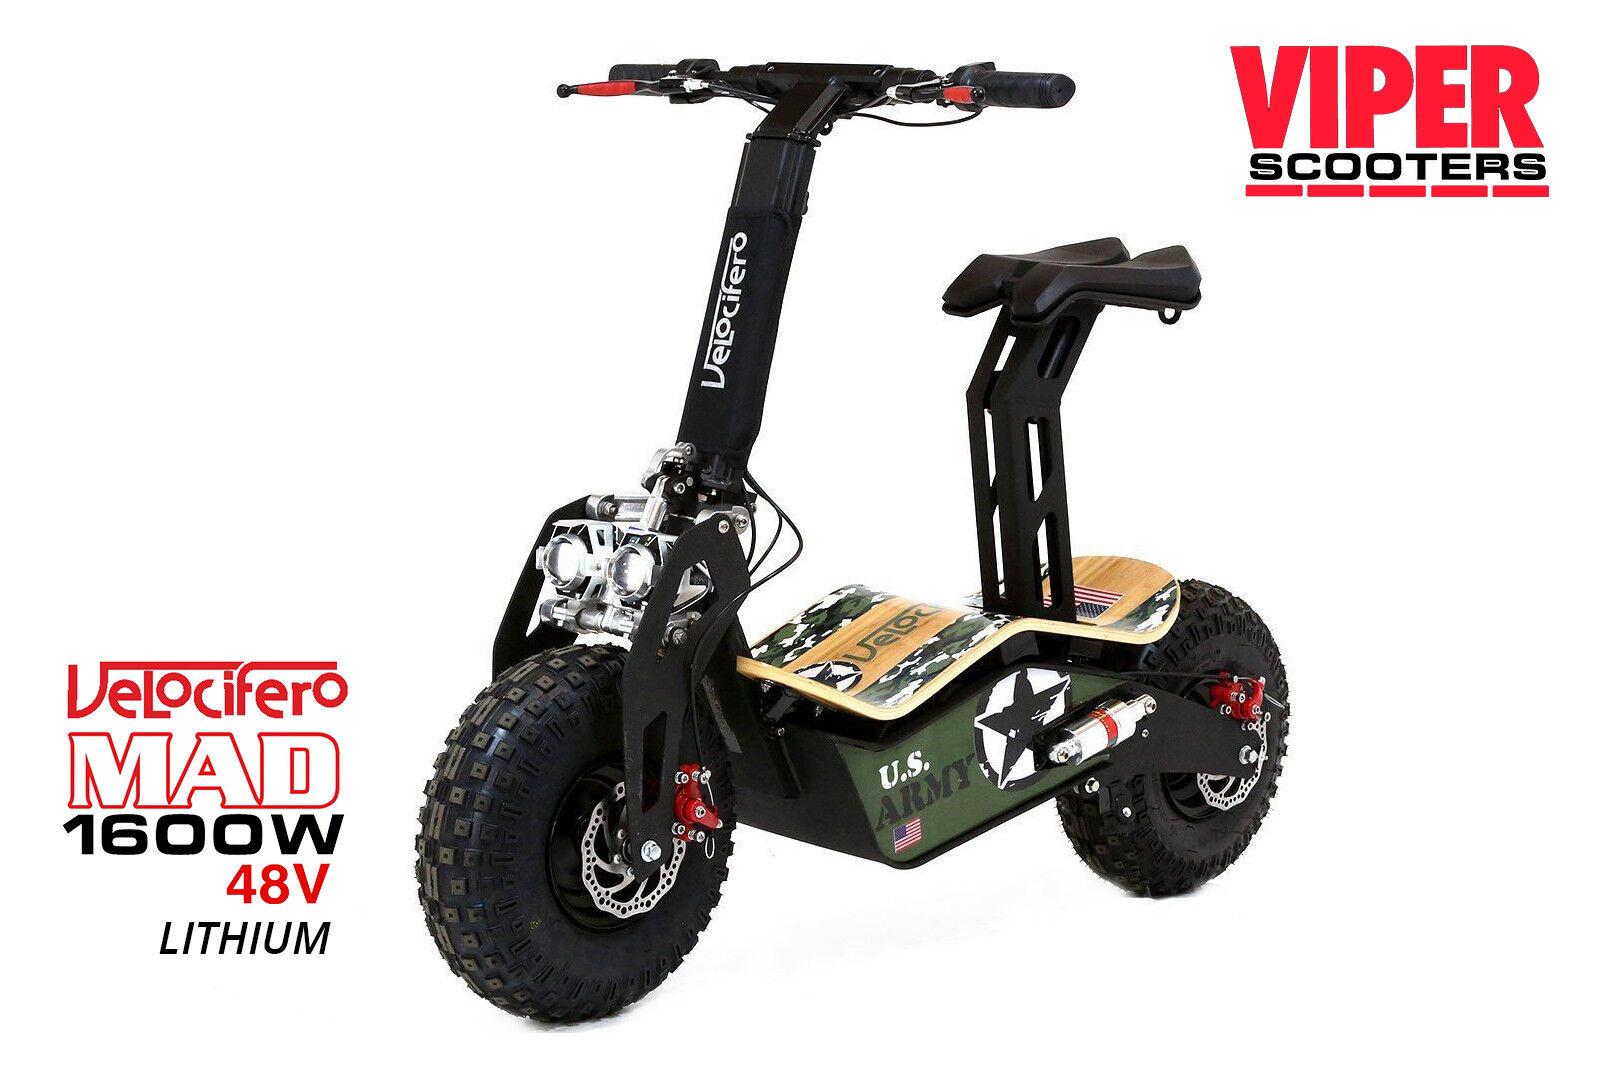 Velocifero Mad New 2019, 1600W 48V Lithium  Electric Scooter, ARMY, VS